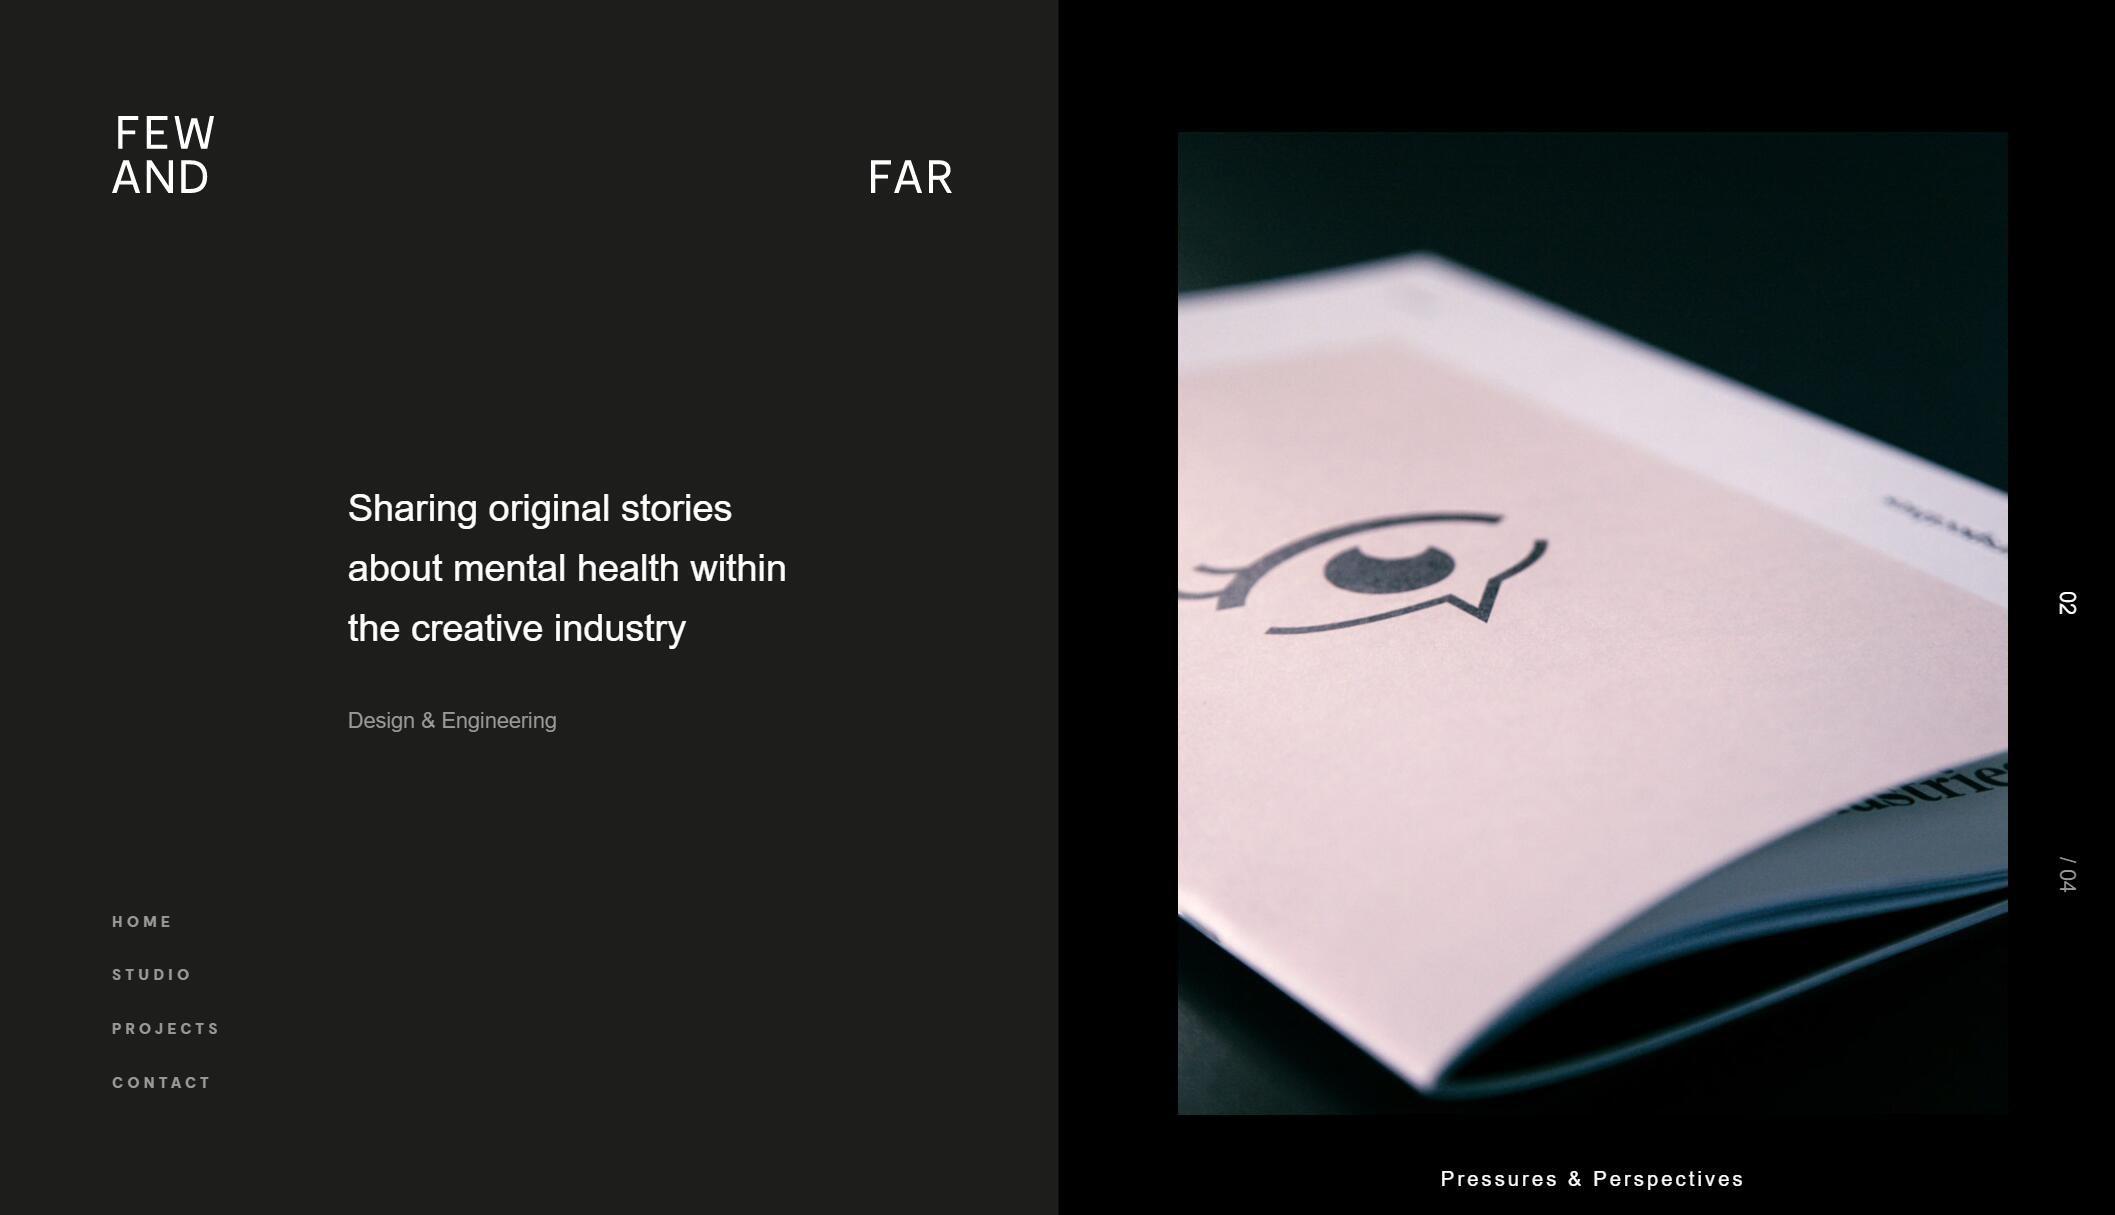 Website design inspiration – Few and Far